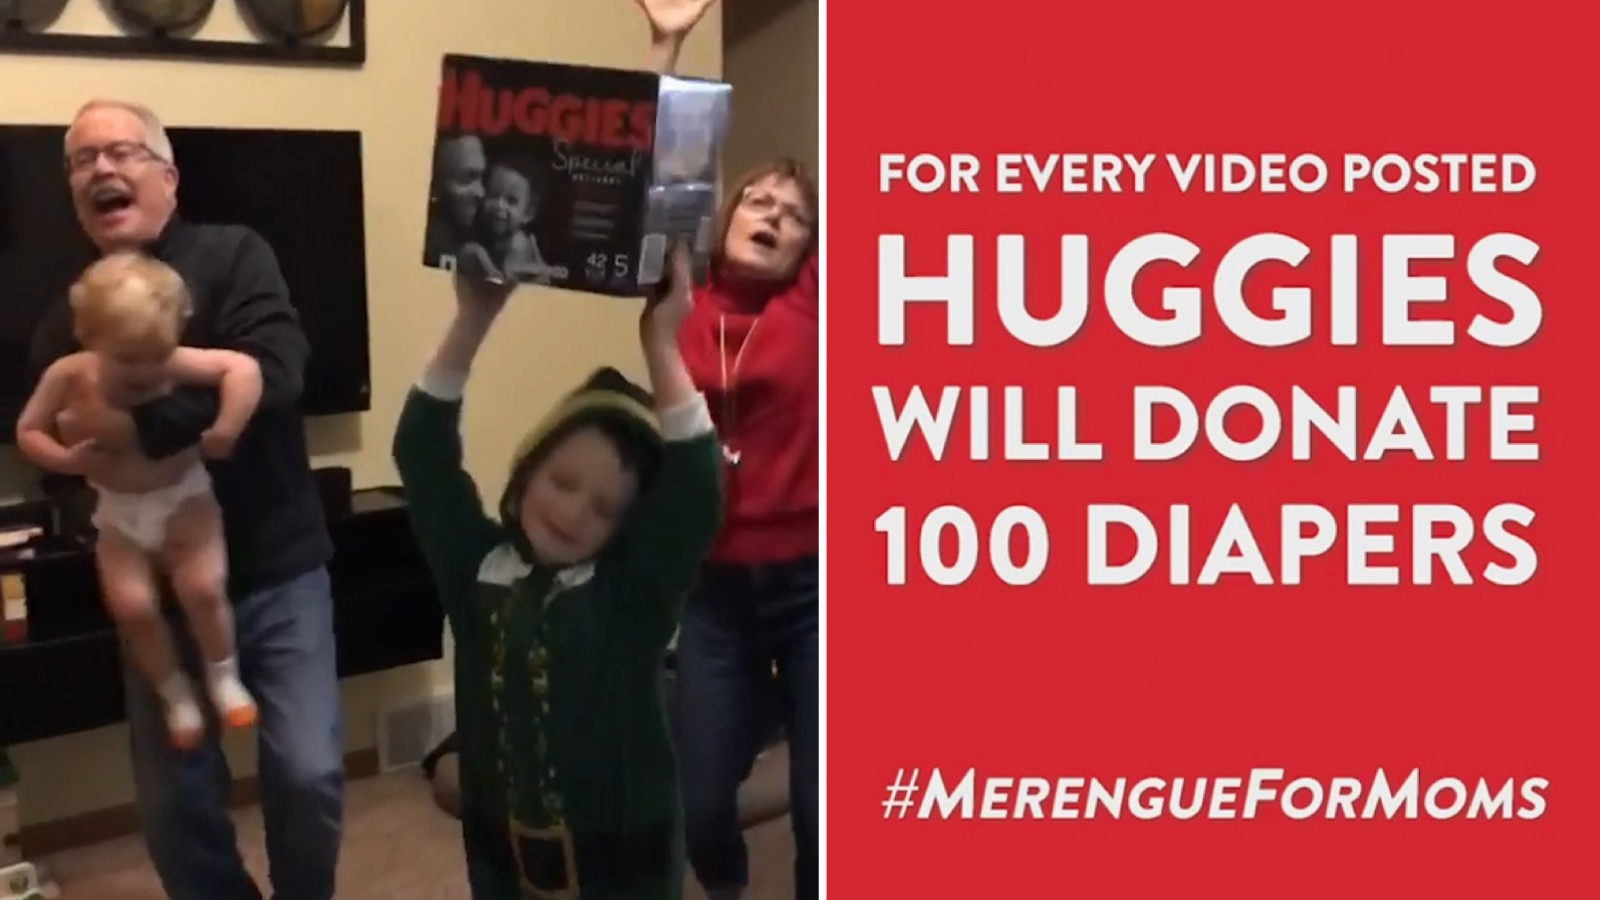 #merengueformoms